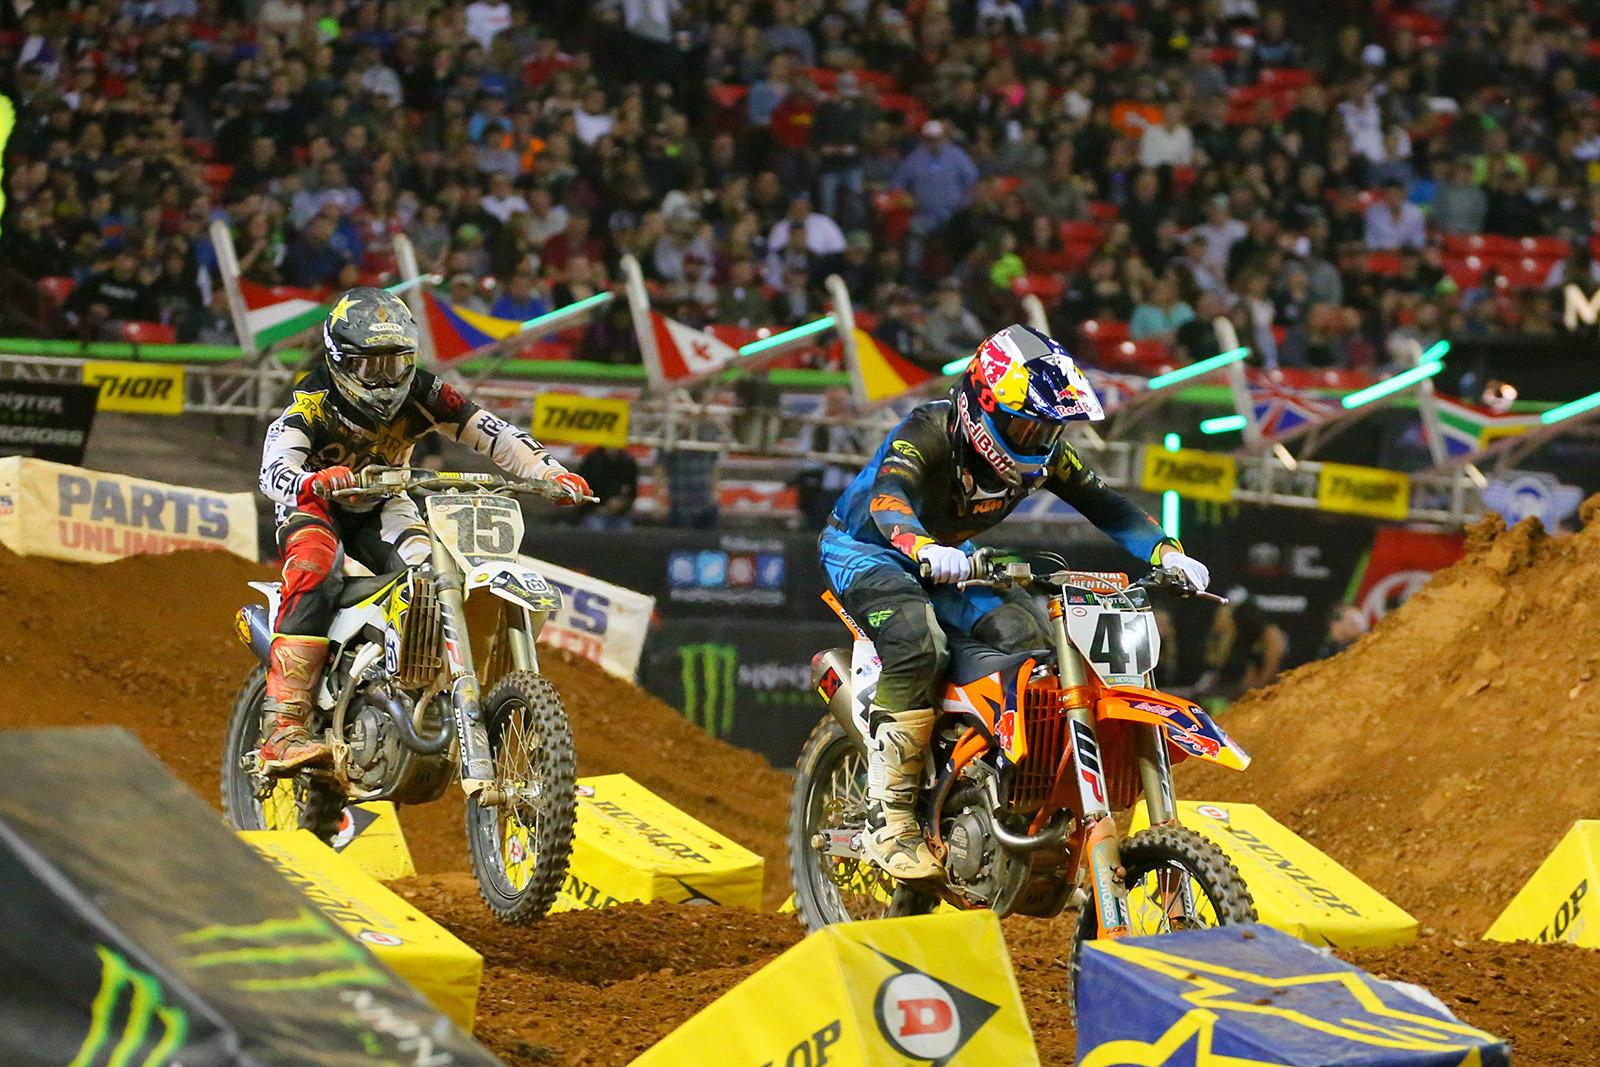 Dean Wilson and Trey Canard - Photo Blast: Atlanta Supercross - Motocross Pictures - Vital MX